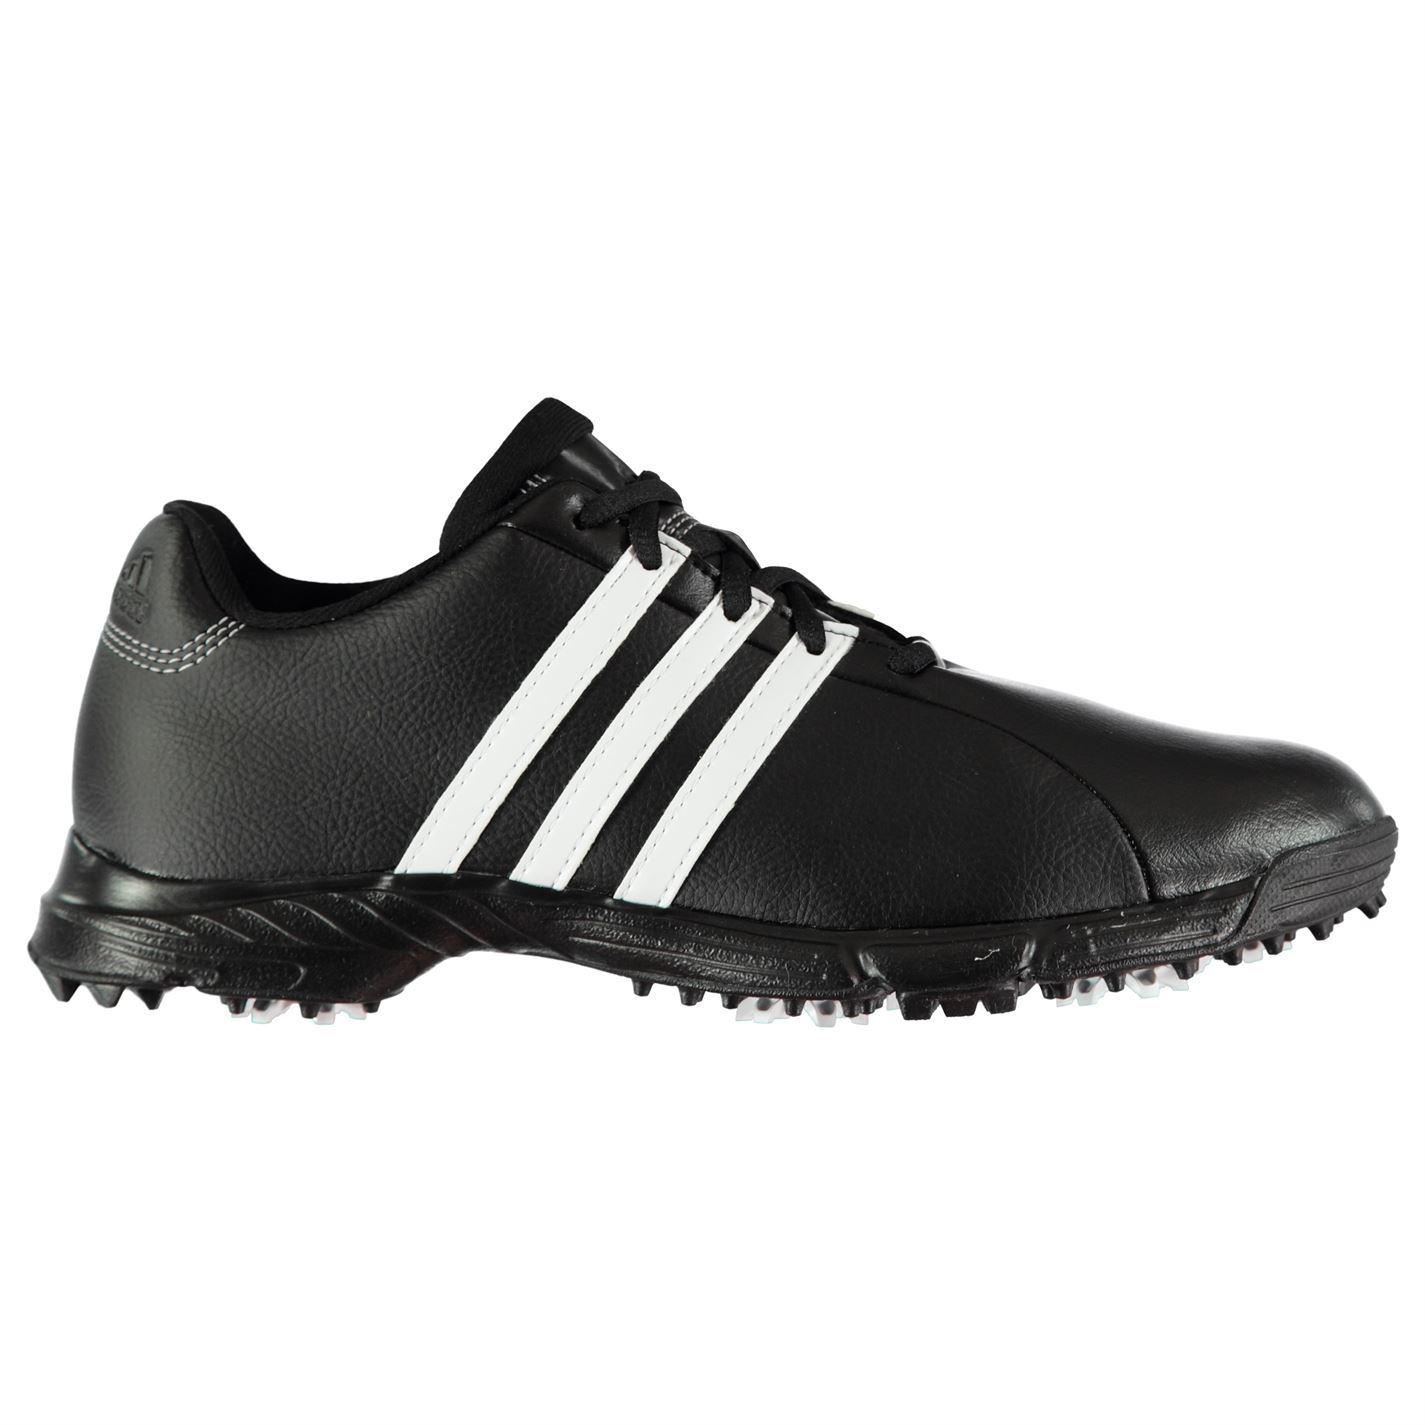 adidas-Golflite-Golf-Shoes-Mens-Spikes-Footwear thumbnail 3